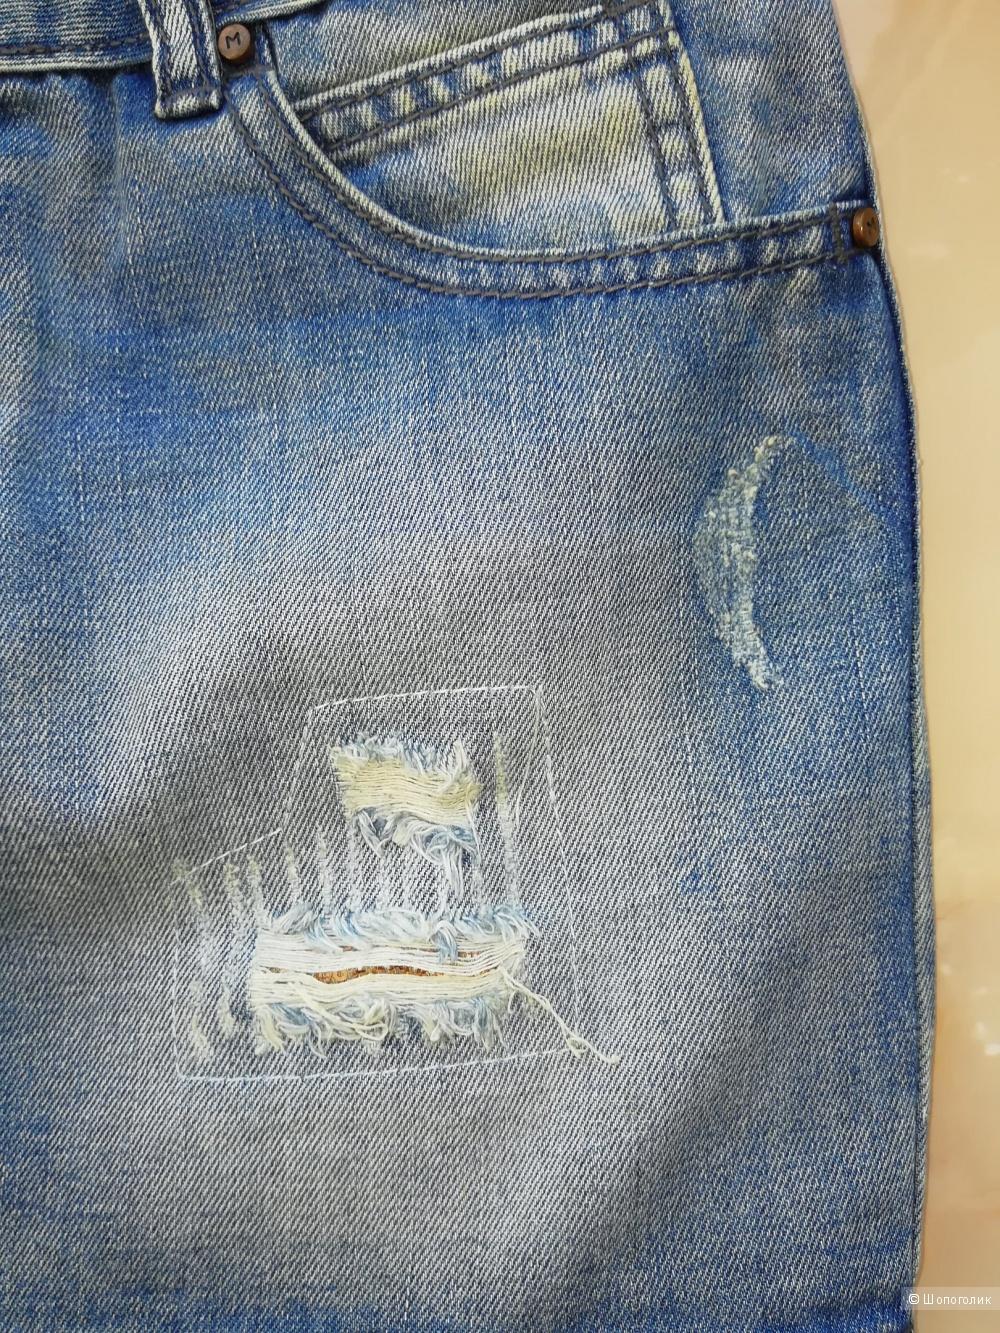 Motivi jeans юбка размер UK 10 US 6 на 44